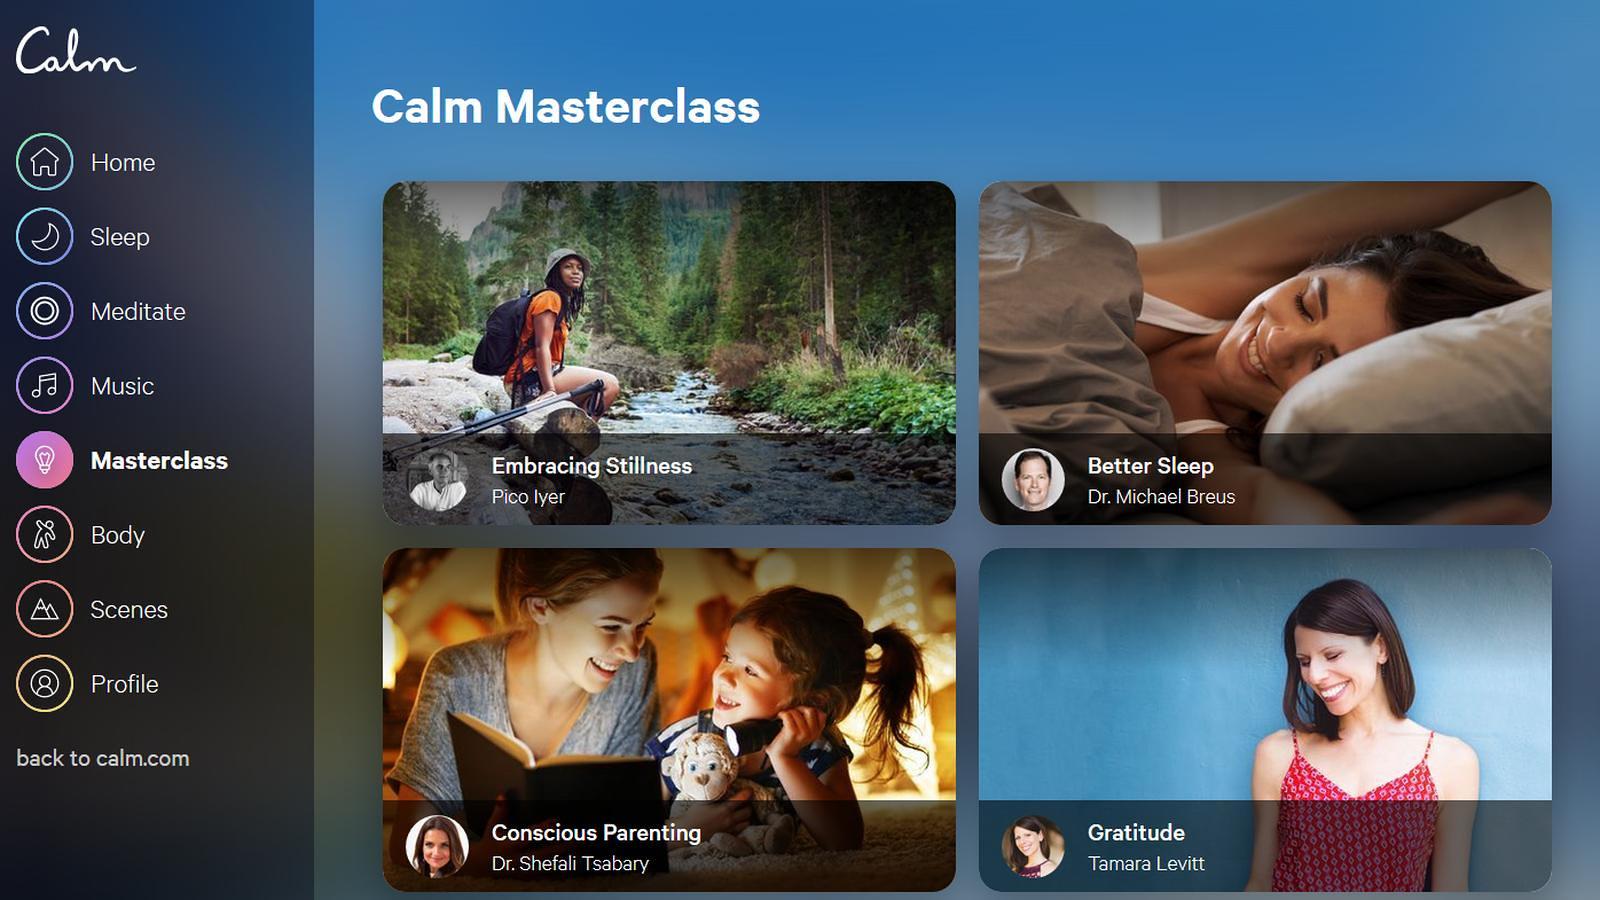 Calm - Masterclass